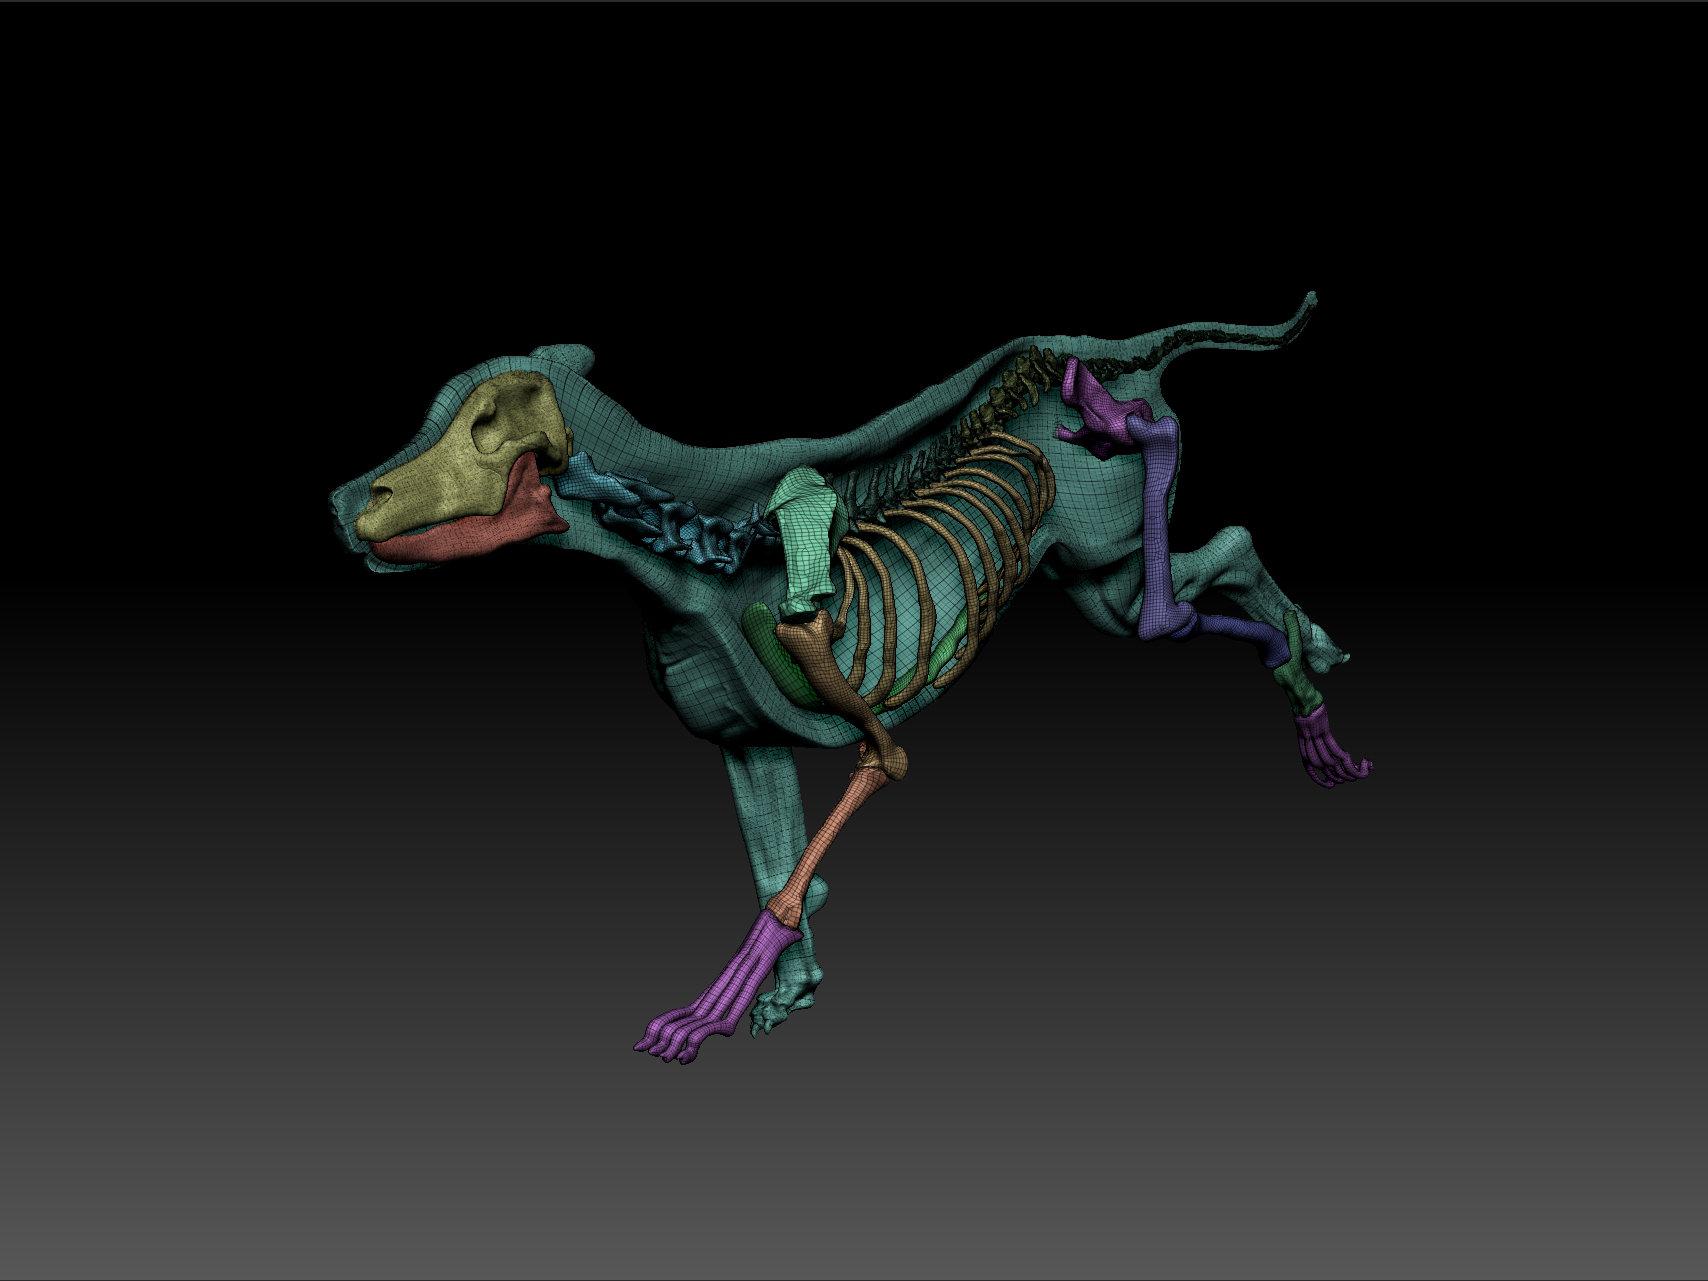 ArtStation - Dog anatomy models for 3d printing, Tom Getty